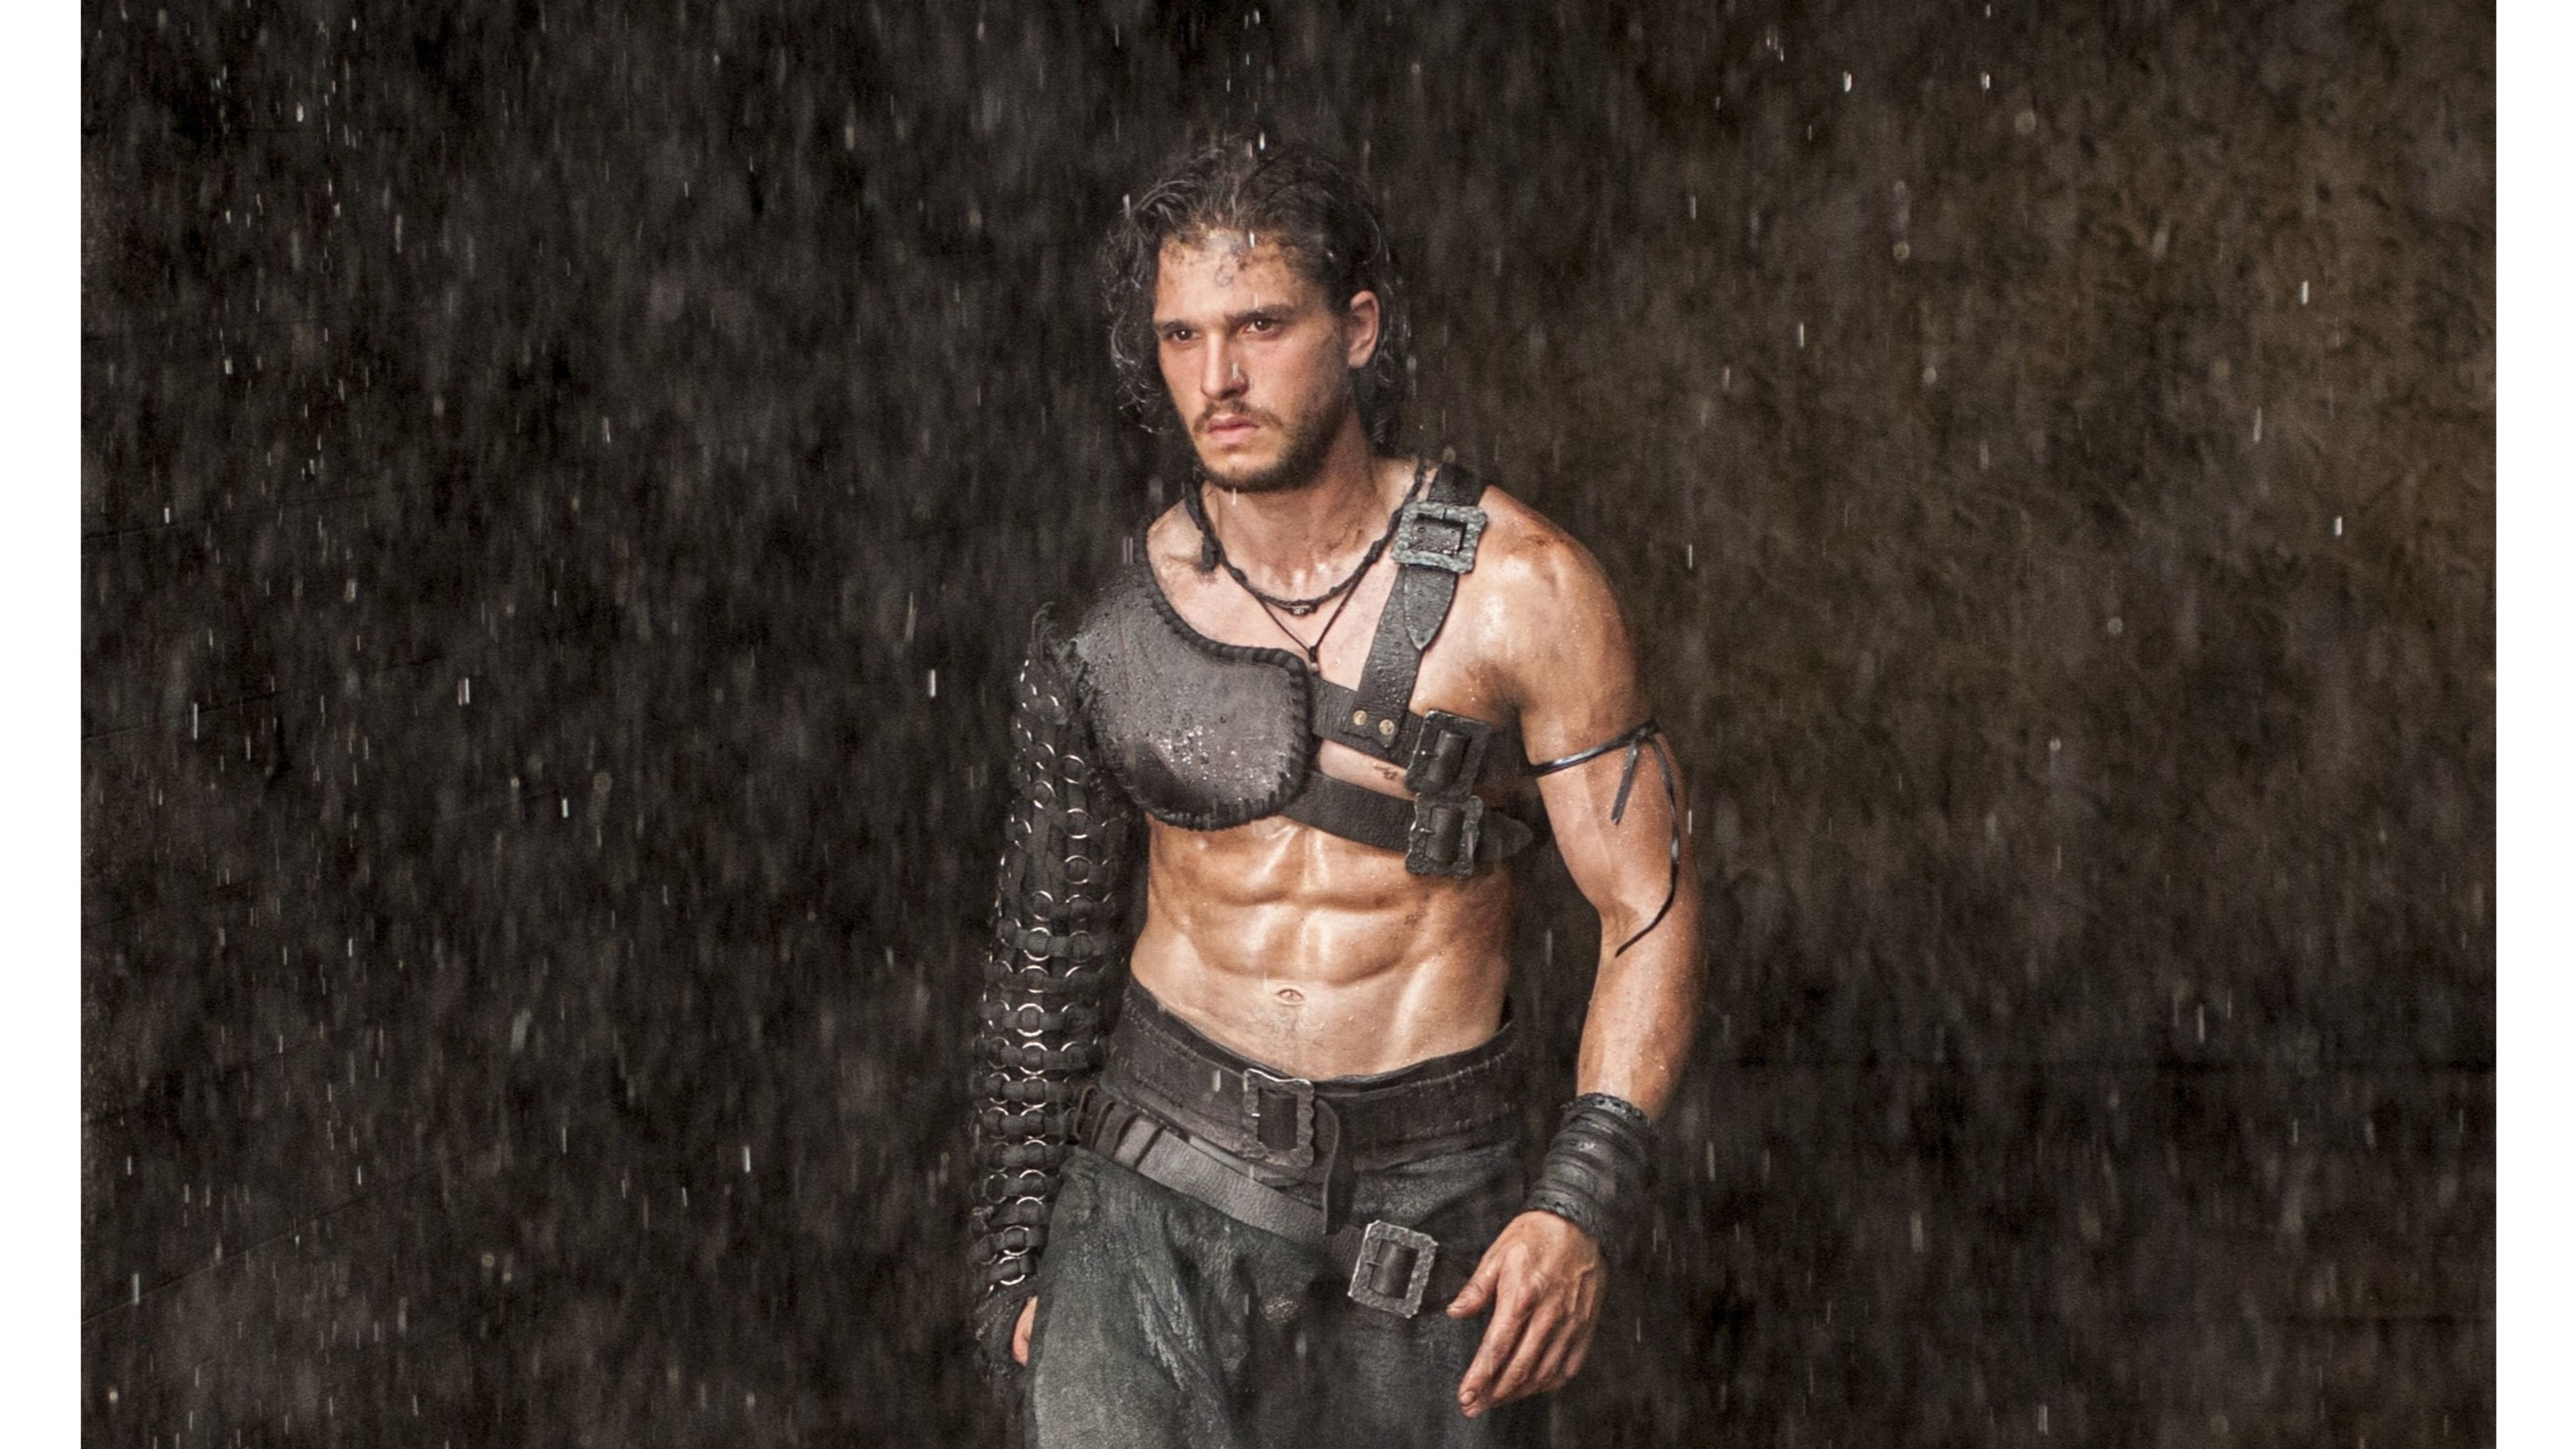 Amazoncom Game of Thrones Season 5 Kit Harington